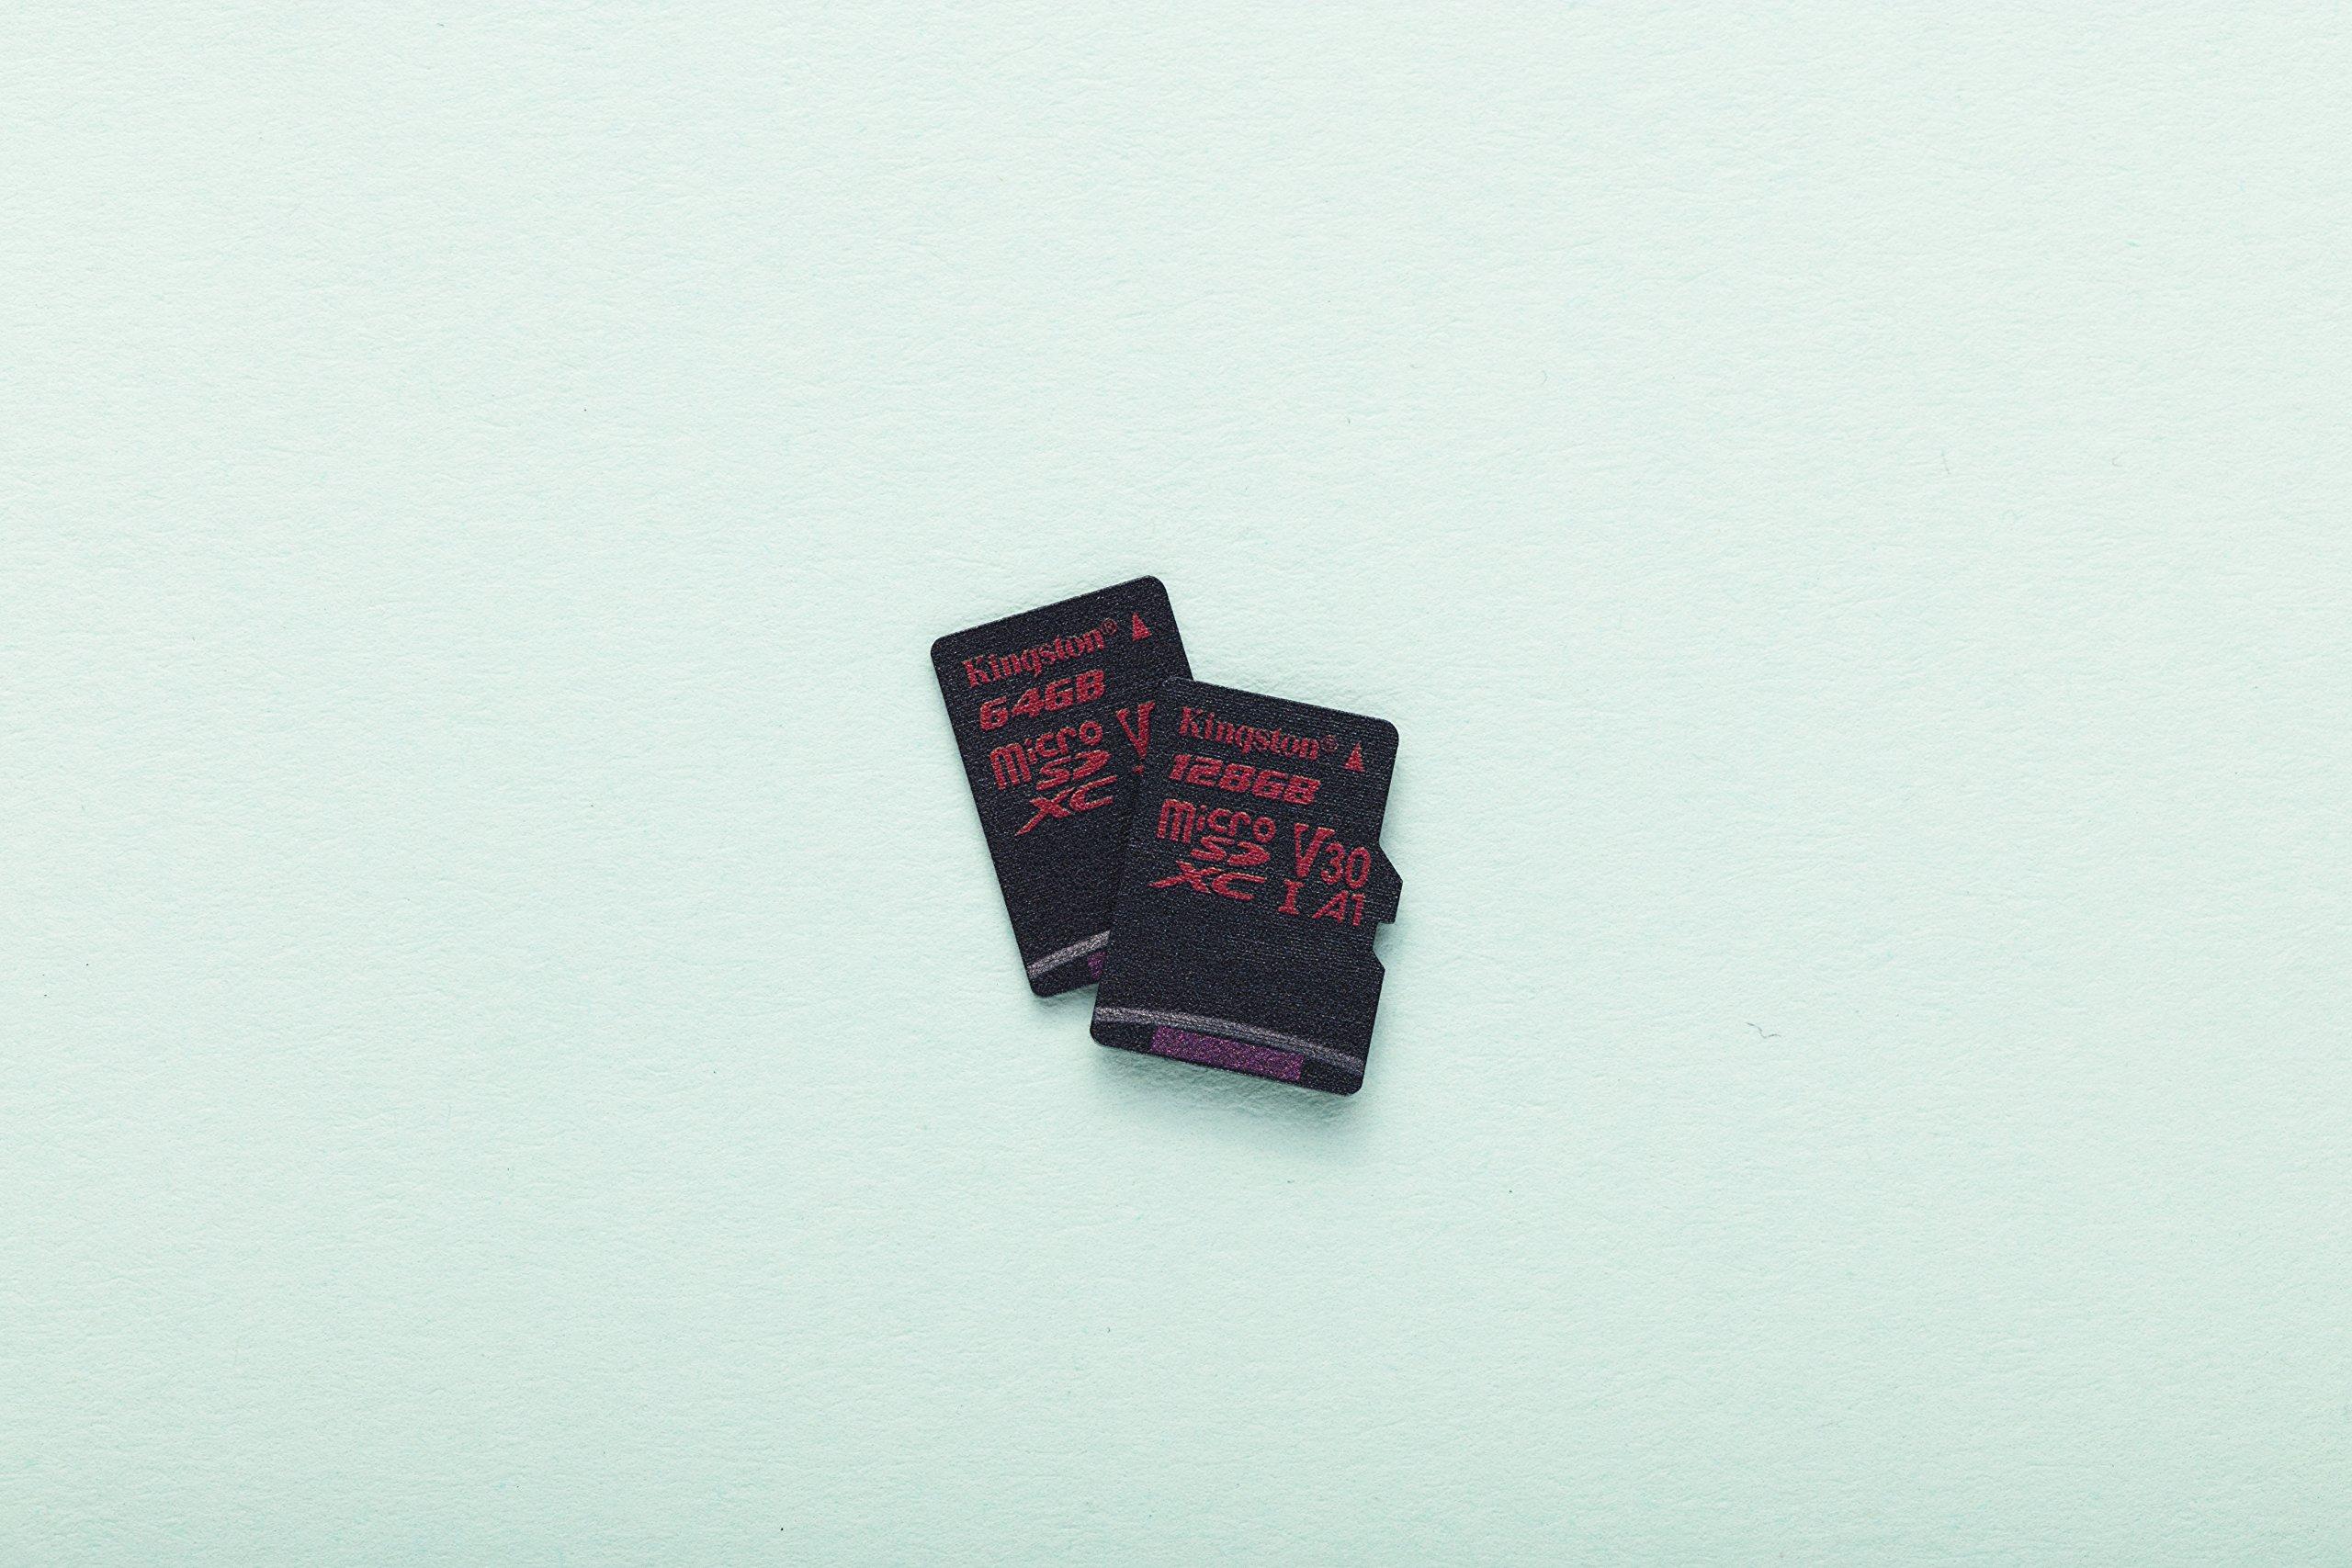 Kingston Digital SDCR/256GB Canvas React 256GB microSDXC Class 10 microSD Memory Card UHS-I 100MB/s R Flash Memory High Speed microSD Card with Adapter by Kingston (Image #5)